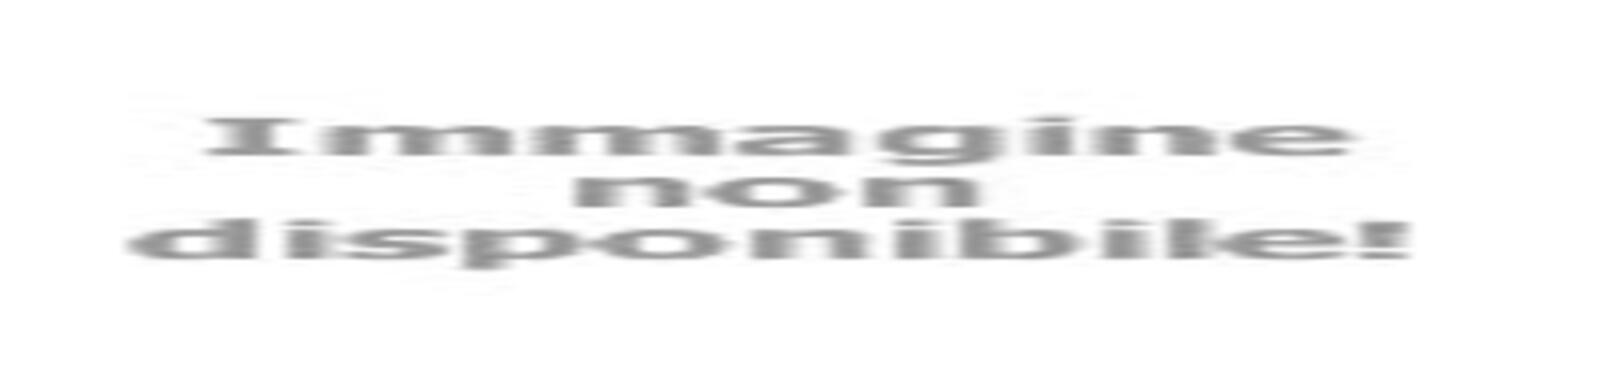 petronianaviaggi it slovenia-n22 002